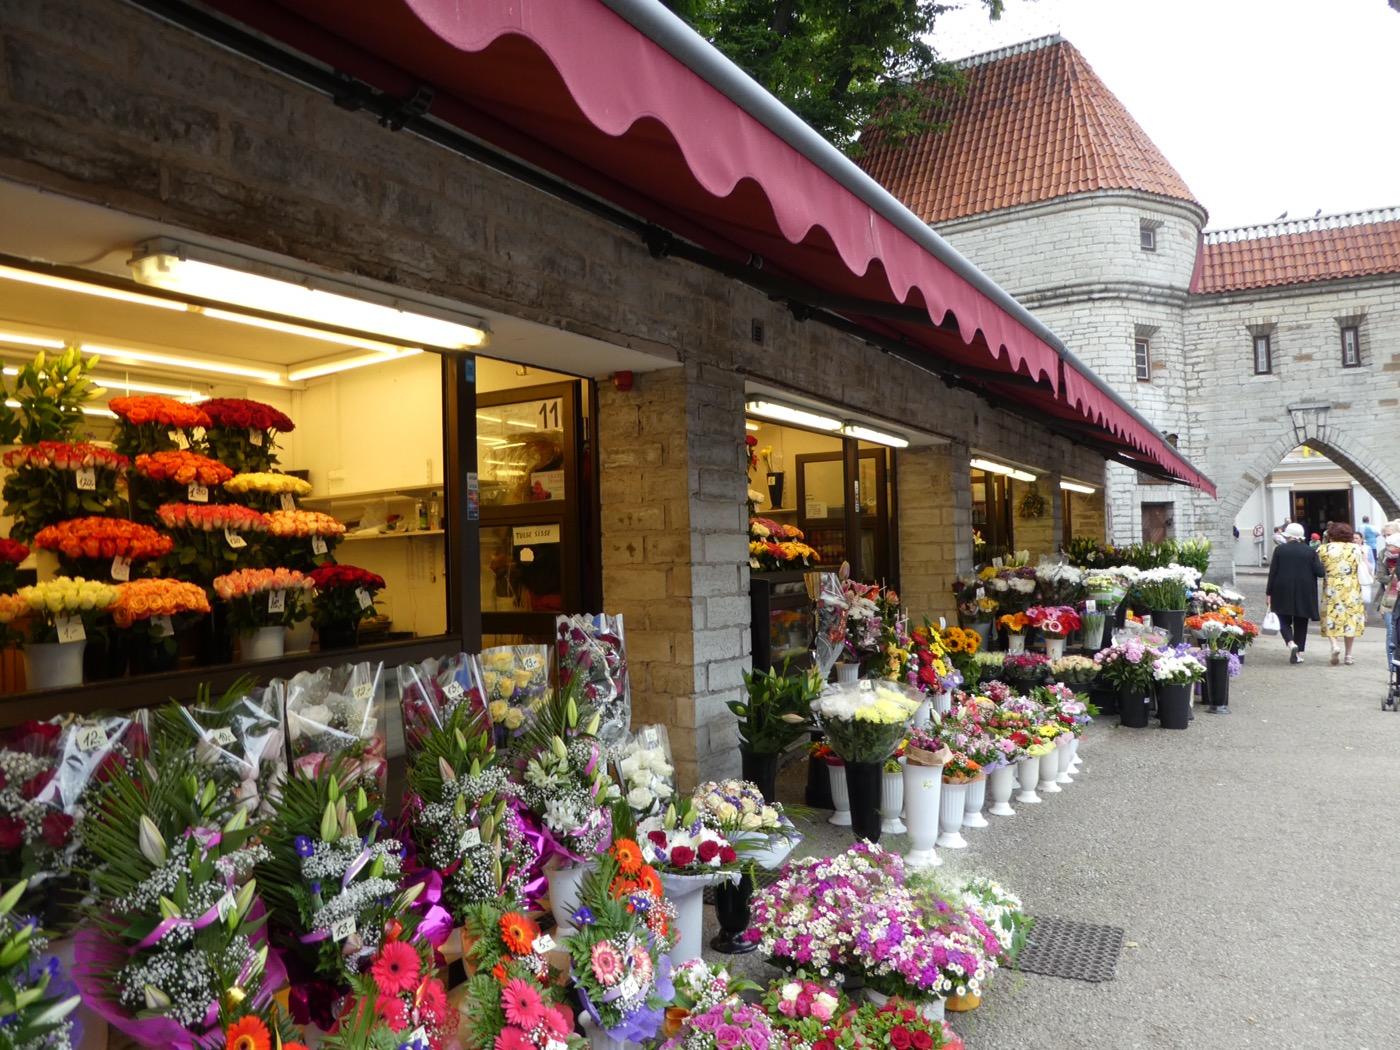 Flower Market, Old Town Tallinn